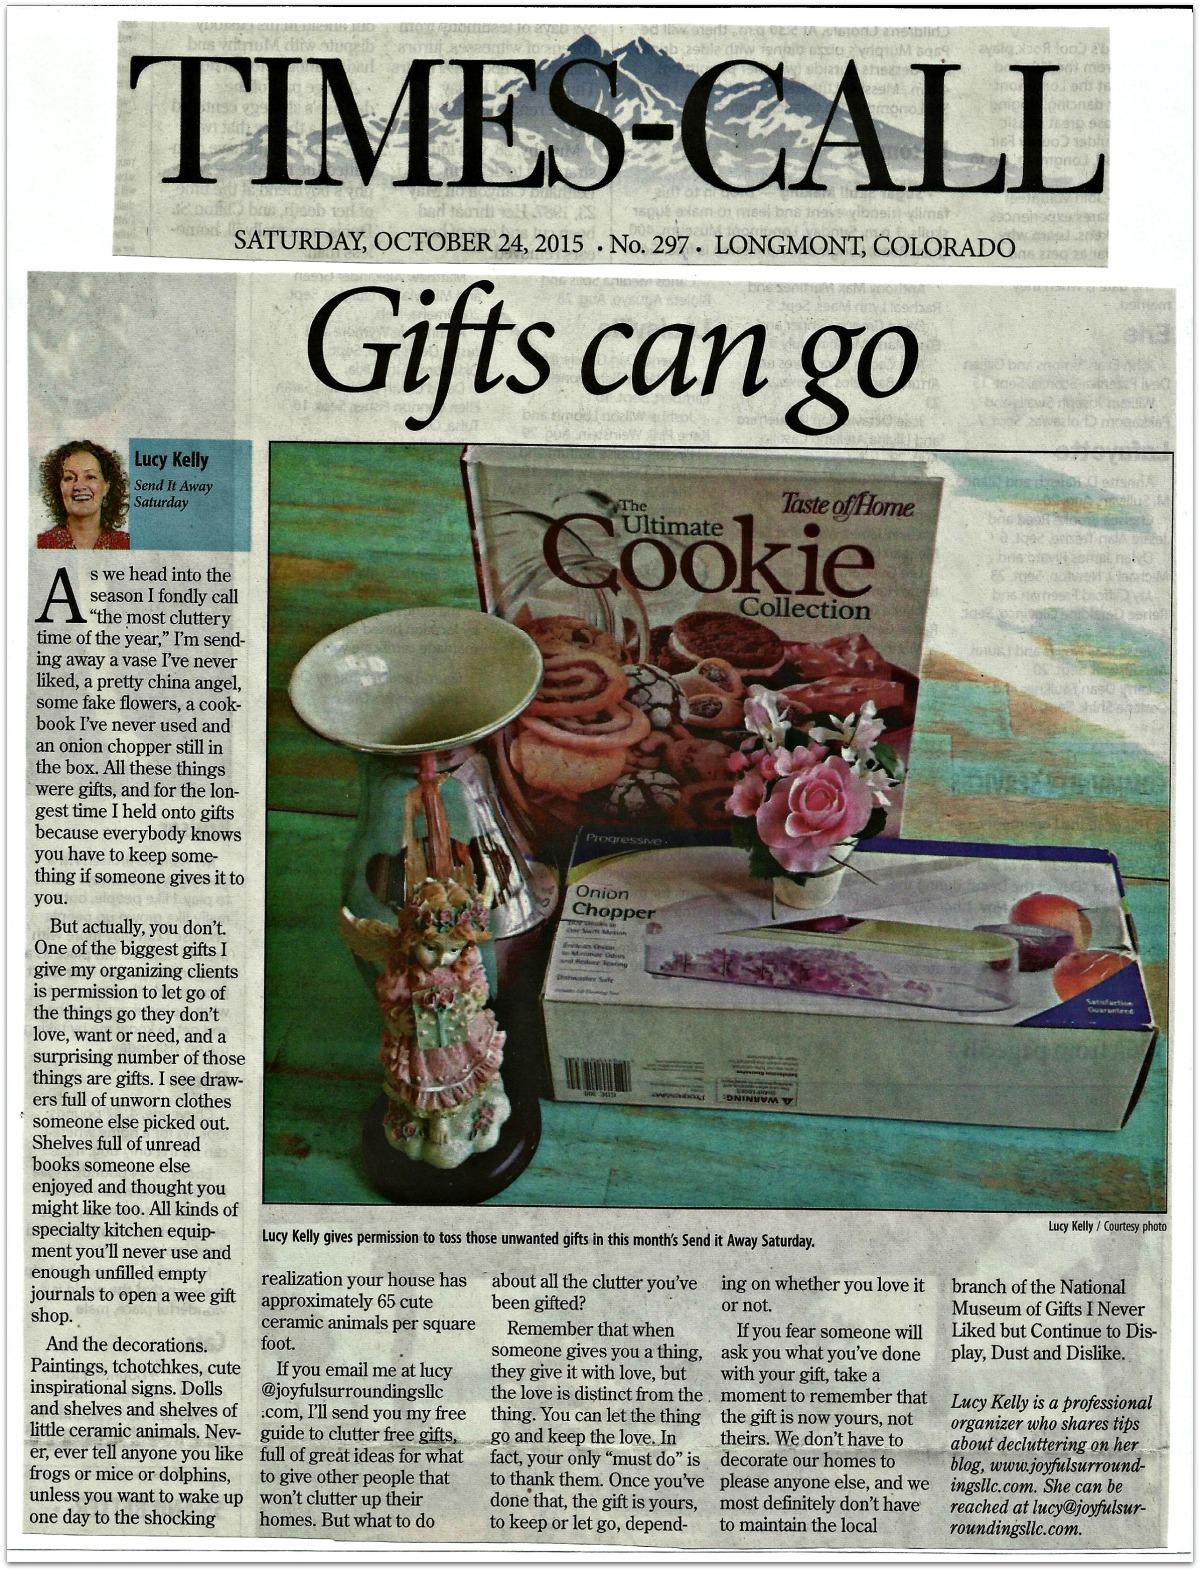 Longmont Times-Call Send it away Saturday column October 2015